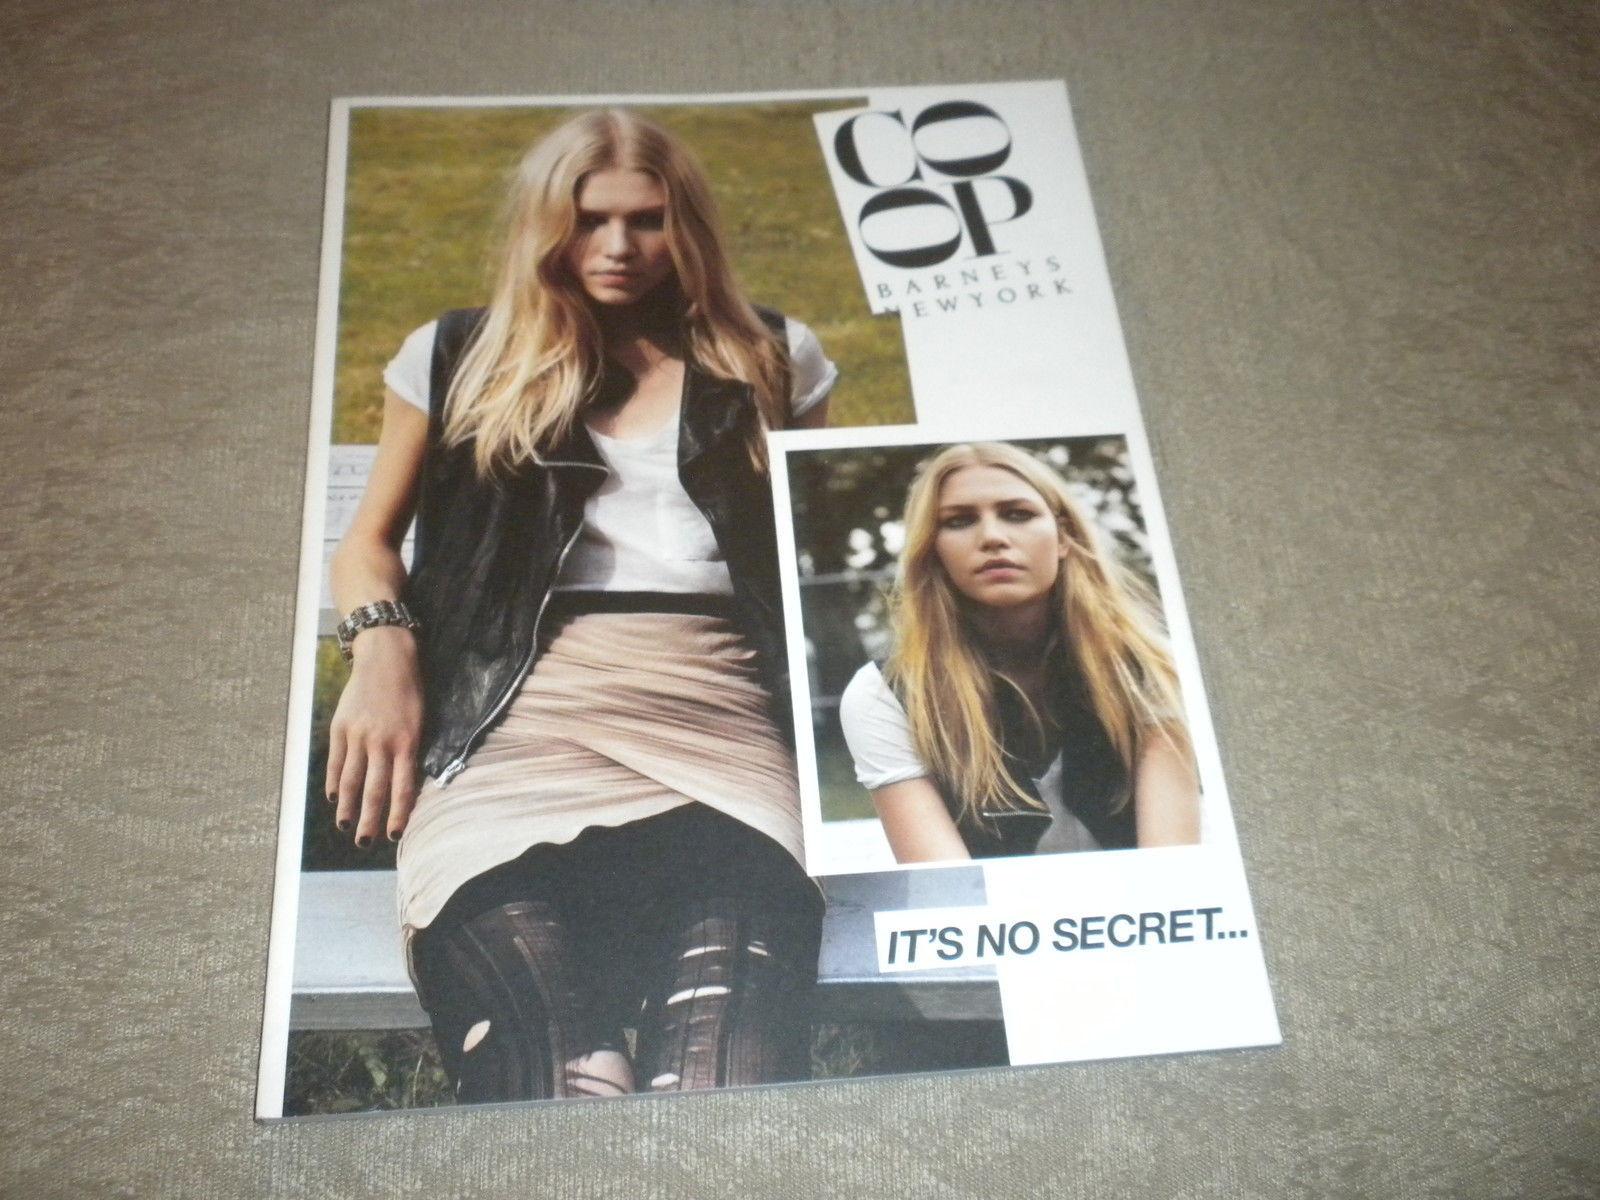 Barneys New York Fall  2008 Co-op It's No Secret Fashion Photo Catalog 53 pgs